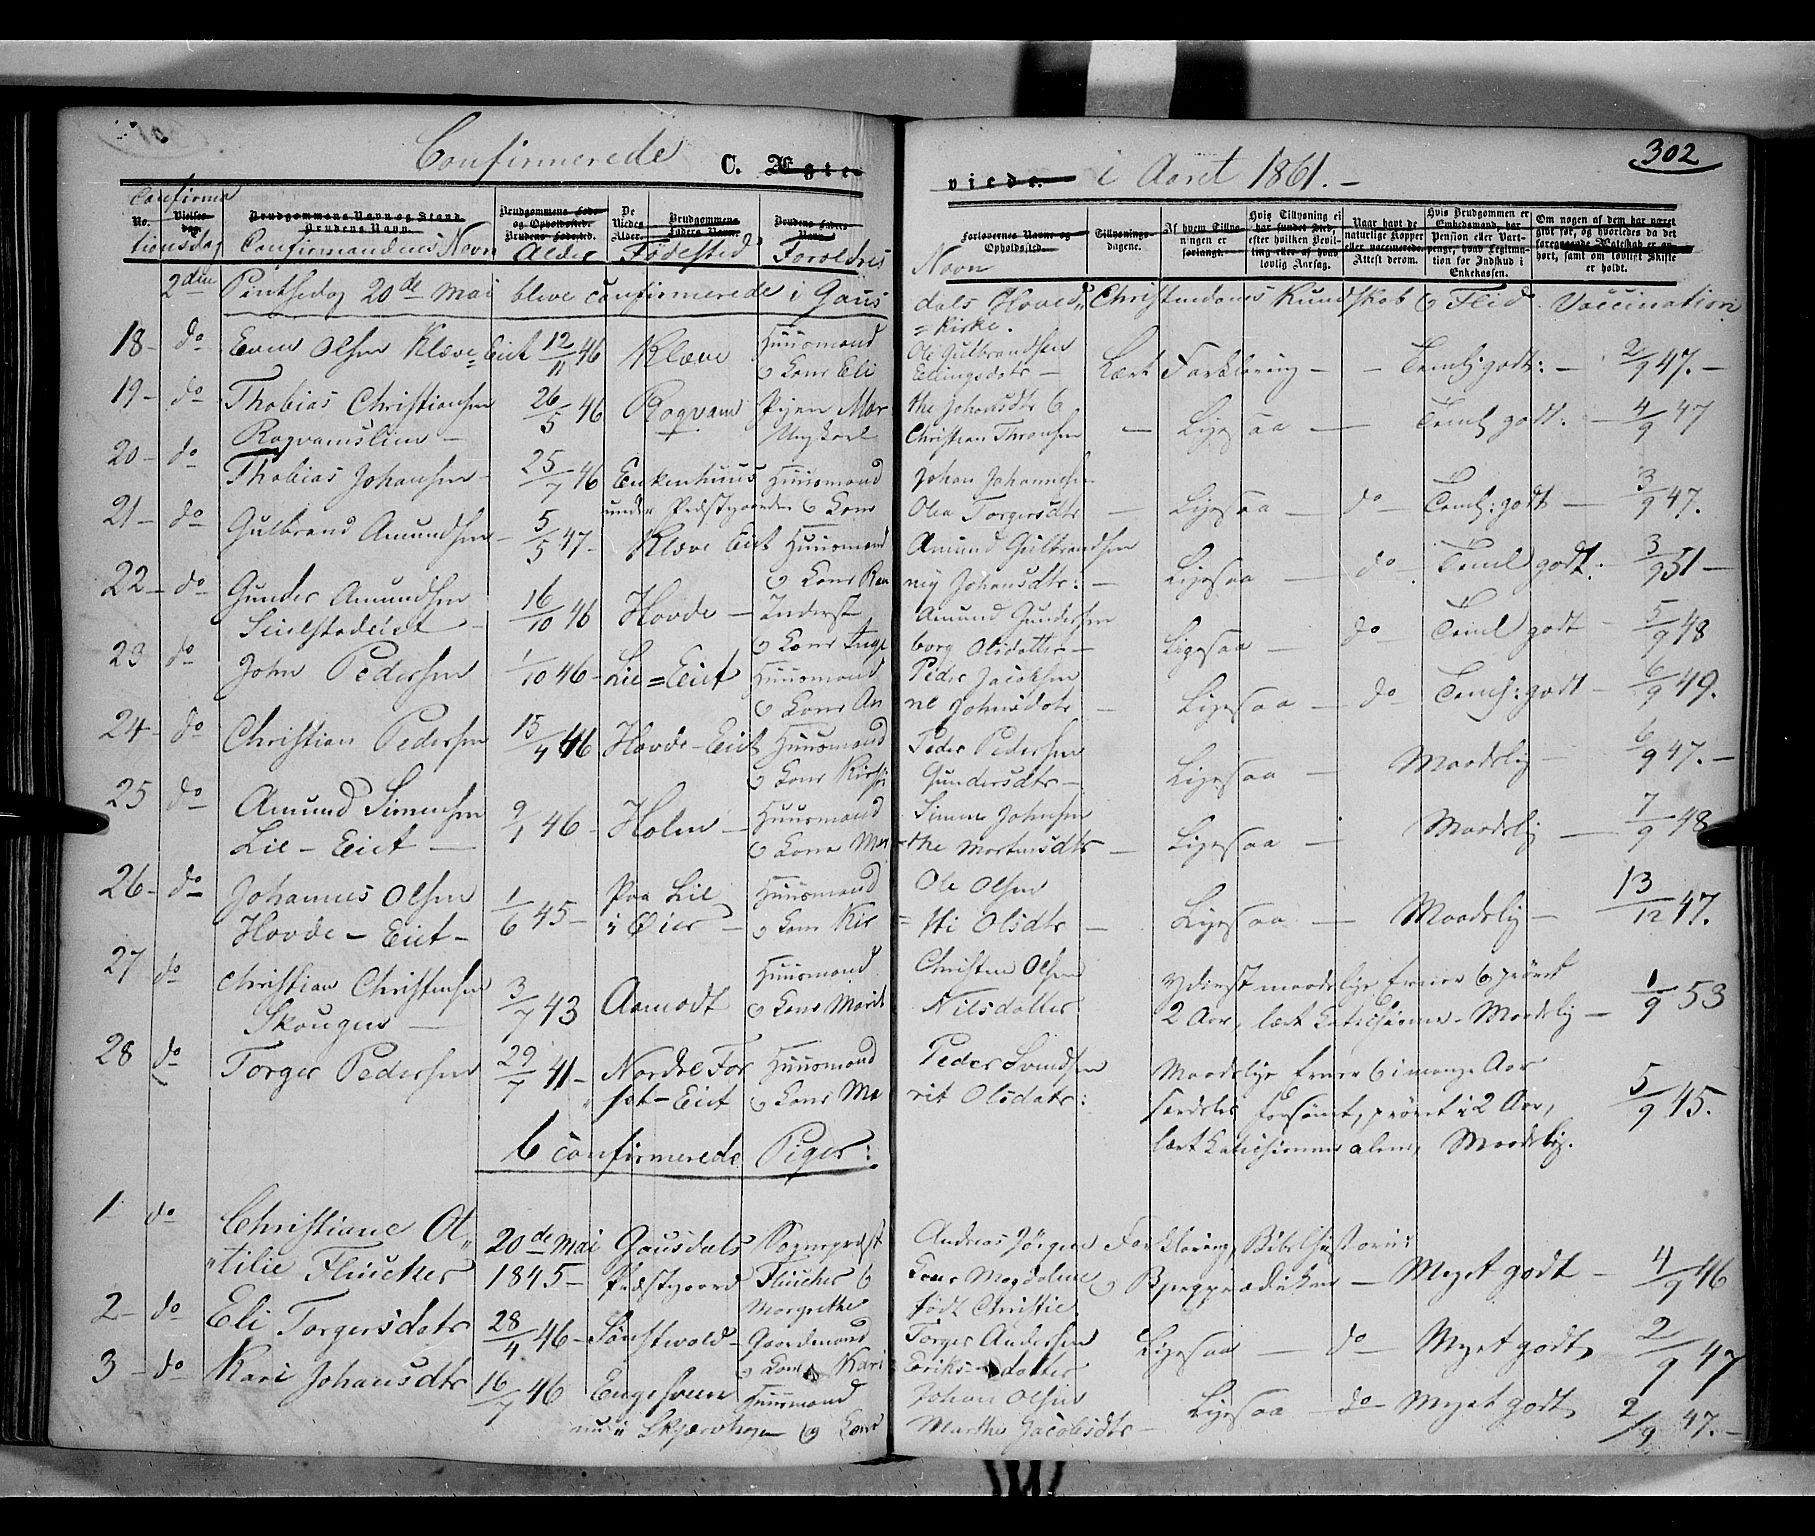 SAH, Gausdal prestekontor, Ministerialbok nr. 8, 1850-1861, s. 302